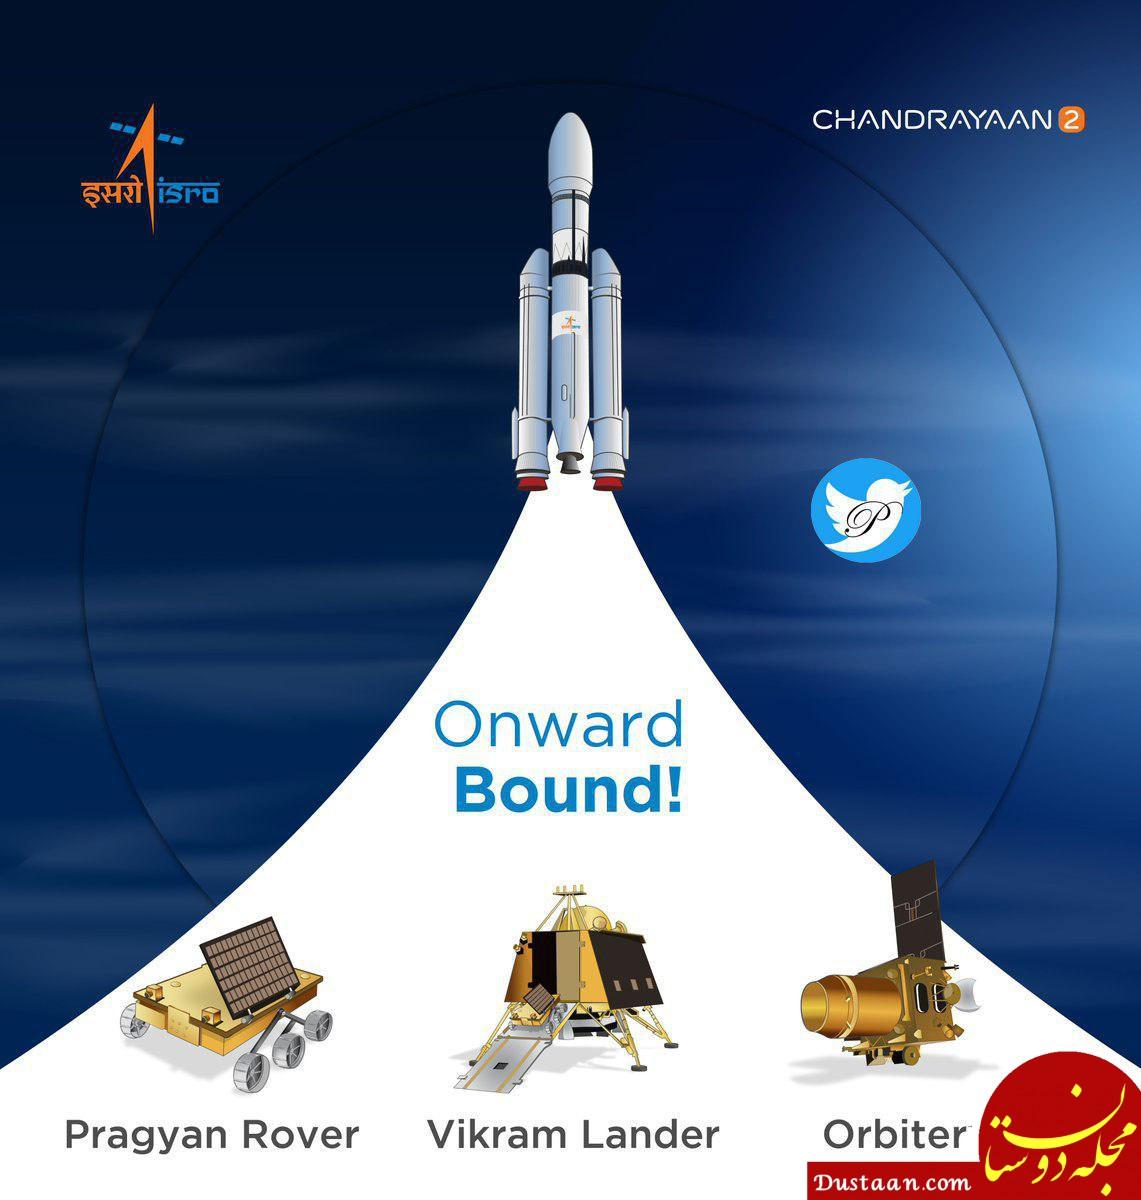 www.dustaan.com هند با موفقیت موشک خود به سوی ماه را پرتاب کرد